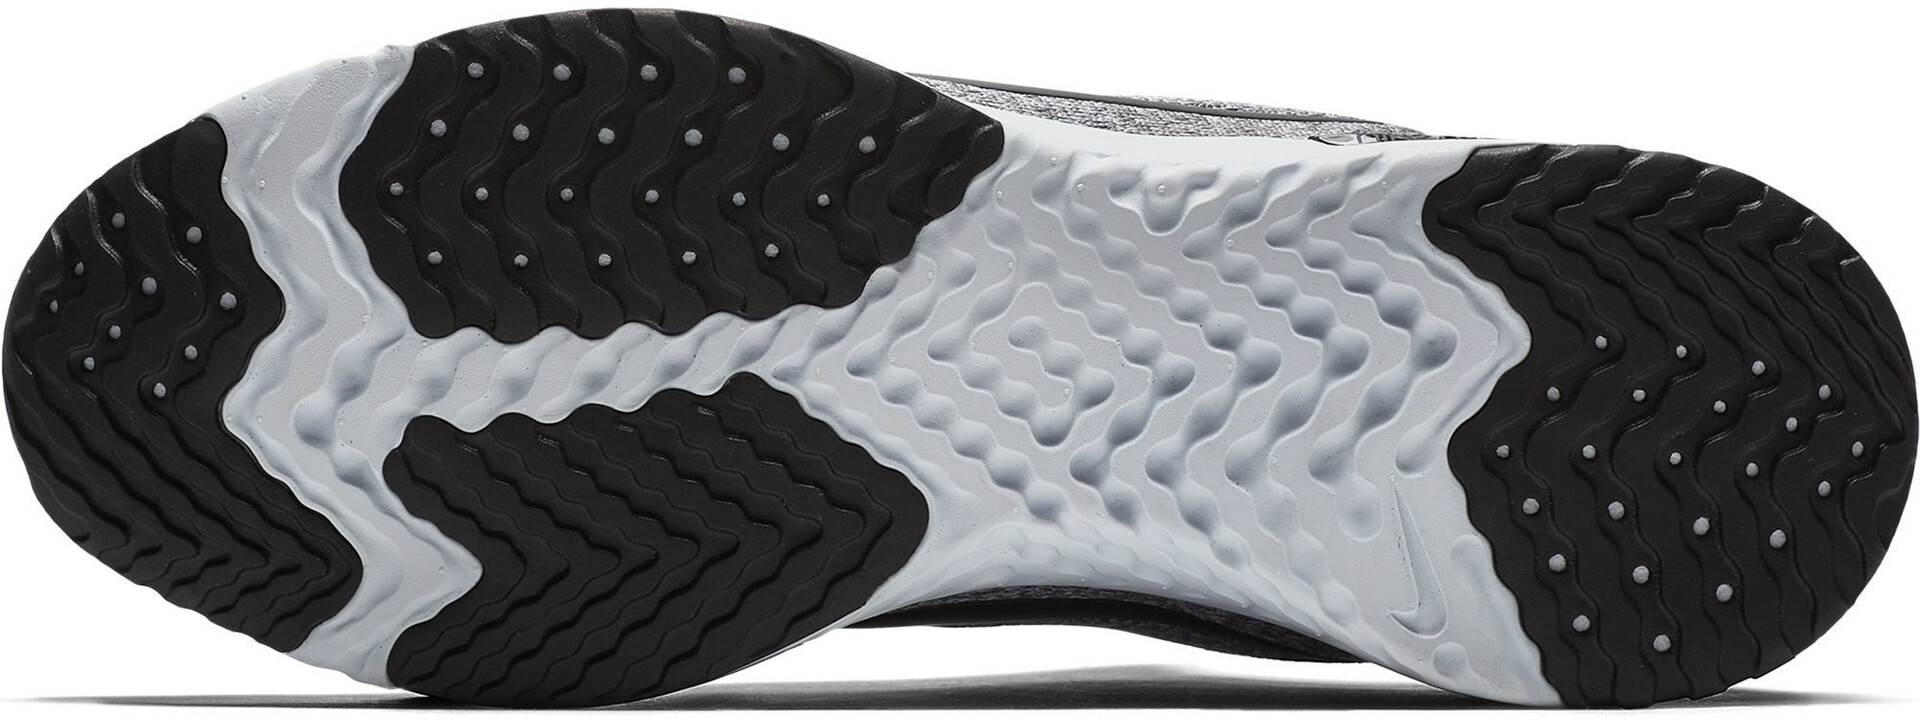 Chaussures Odyssey Nike Running React Sur Gris Femme Campz aEPFPp